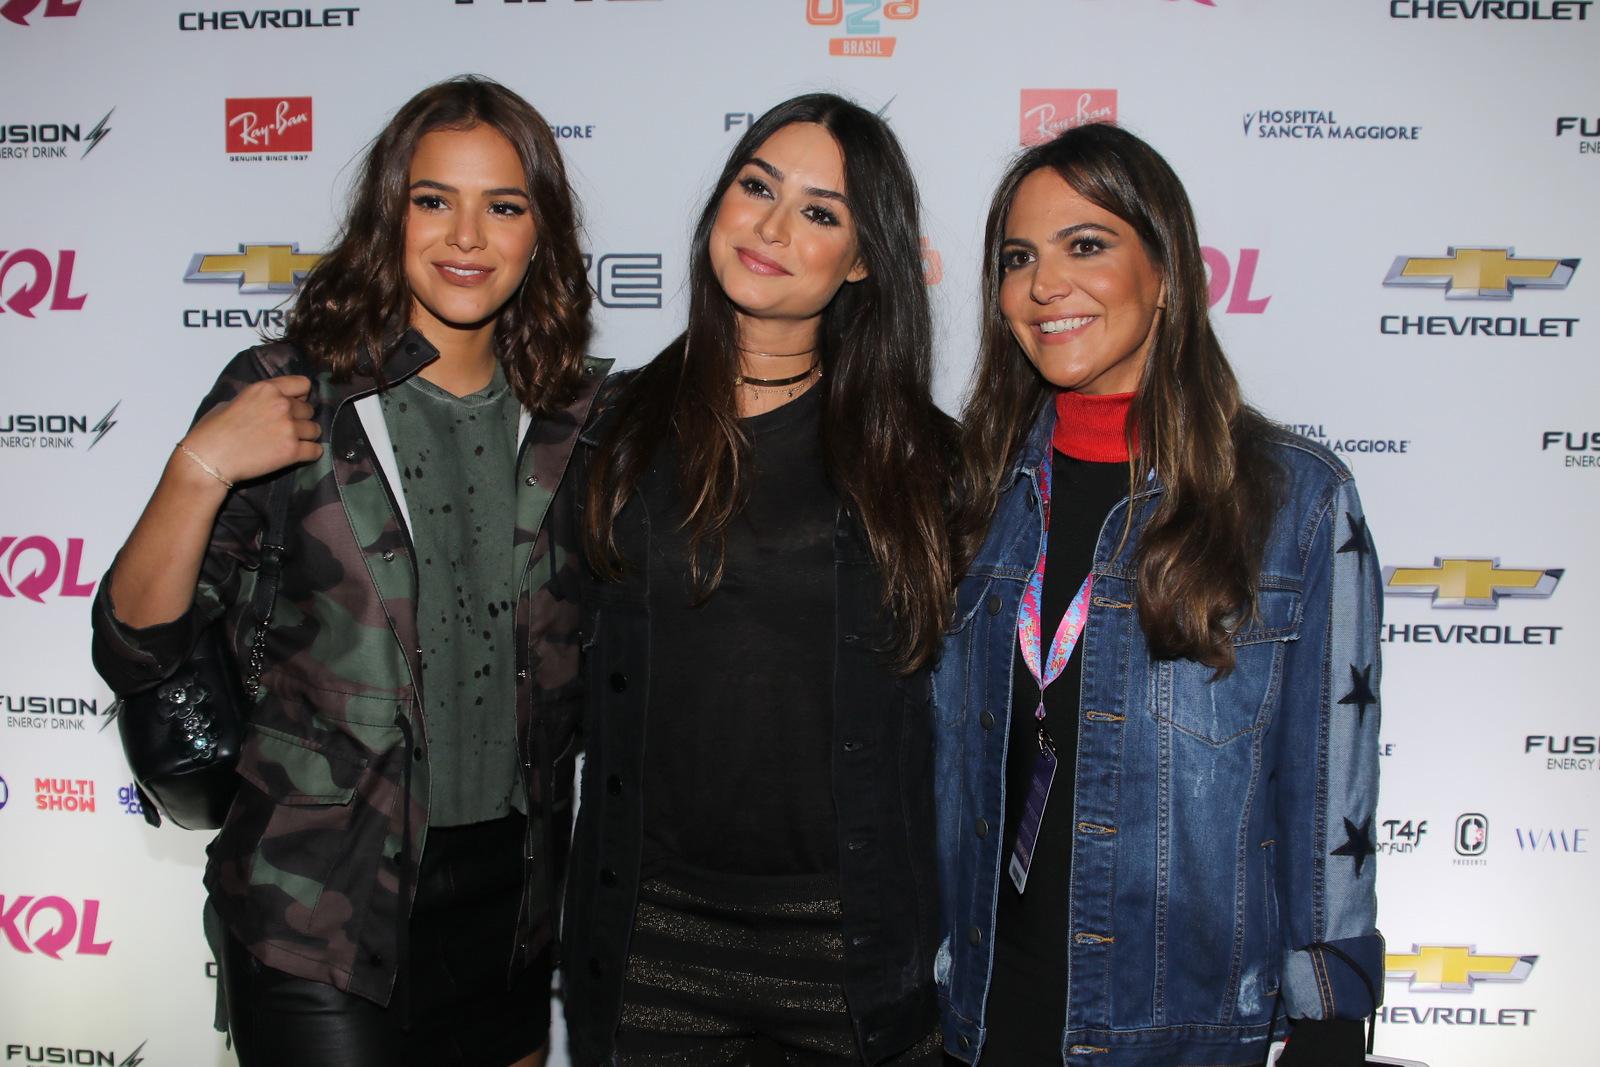 Bruna Marquezine, Thaila Ayala e Carol Sampaio